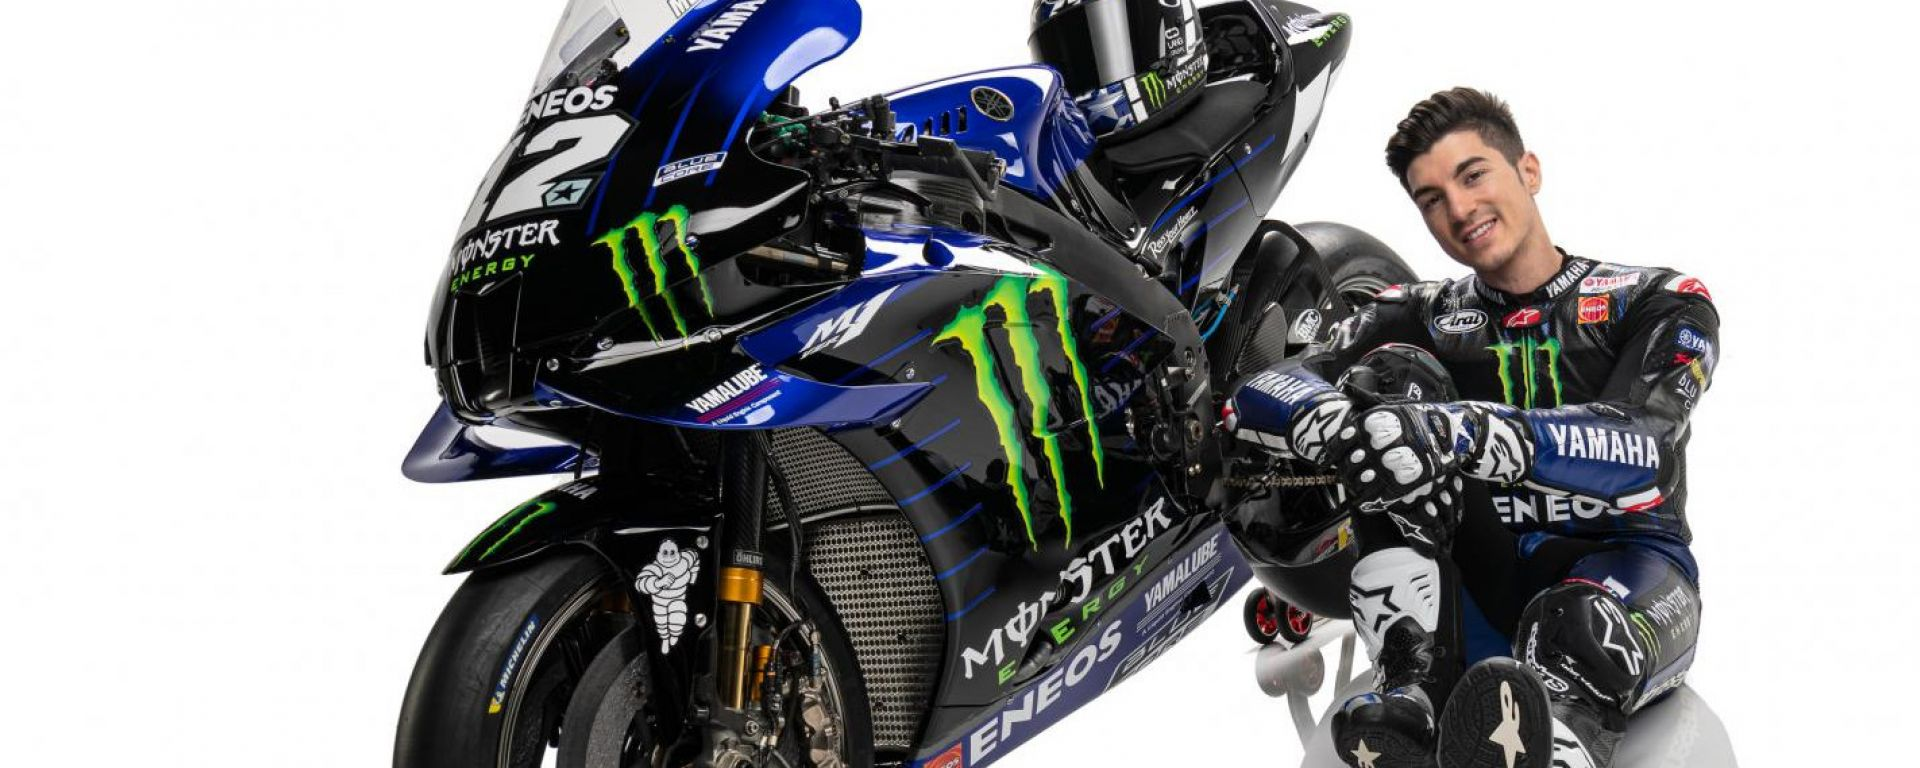 MotoGP 2021, Monster Energy MotoGP, Yamaha YZR-M1: Maverick Vinales